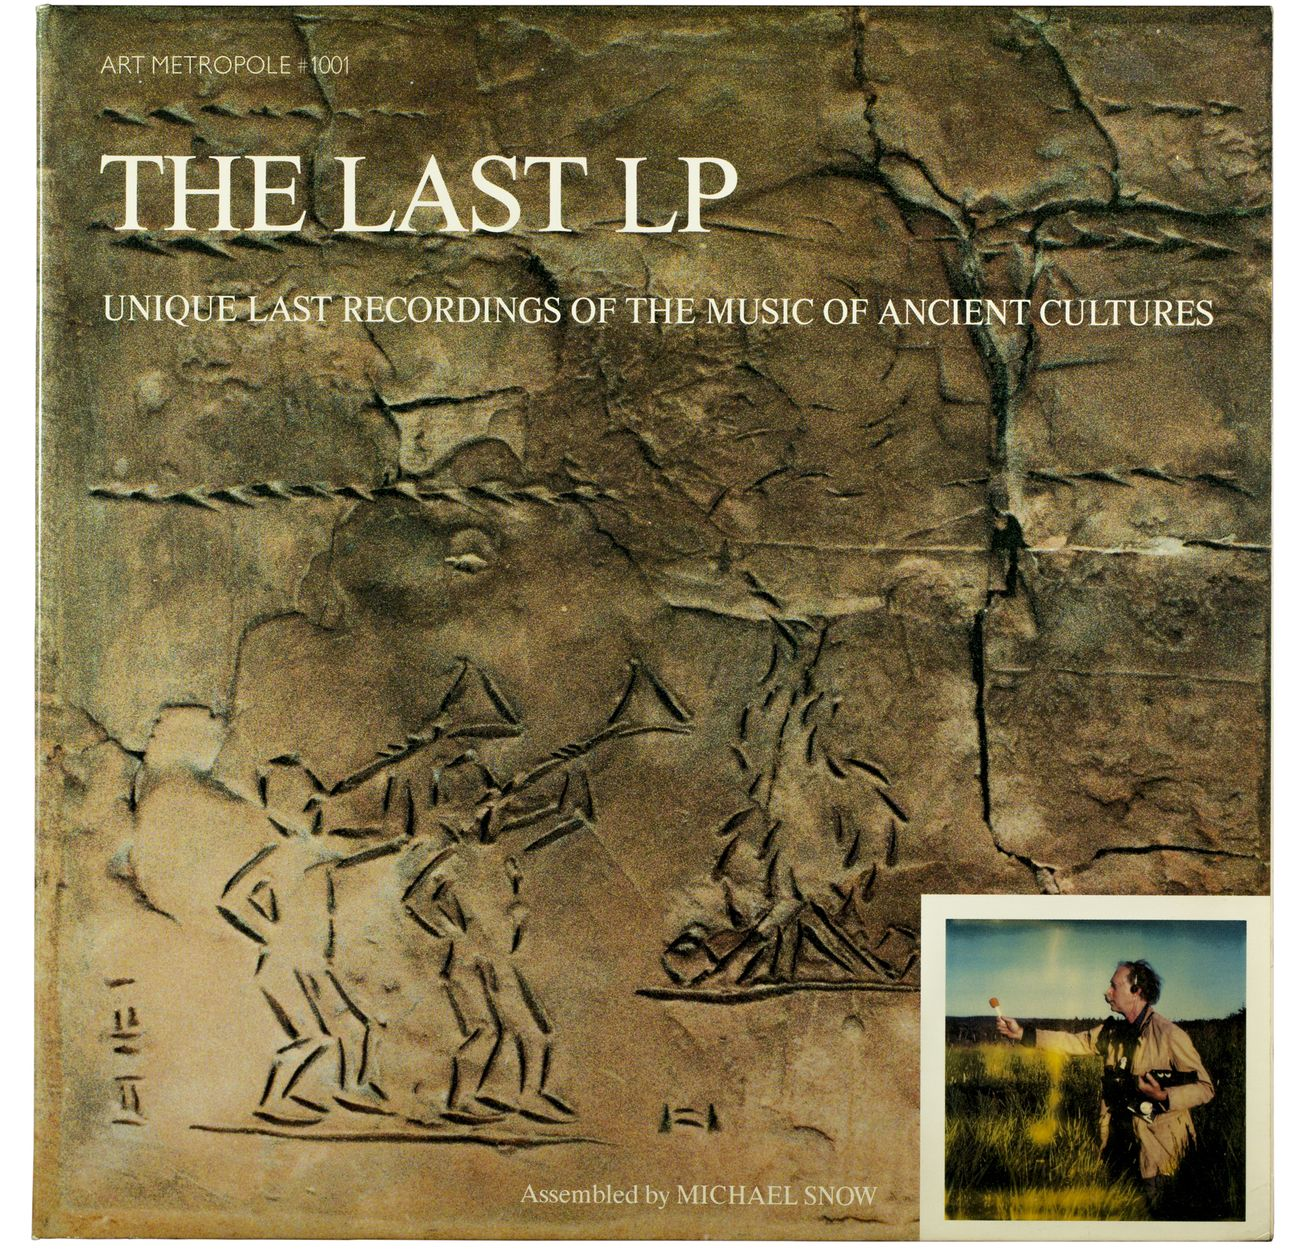 Michael Snow, The Last LP, 1987. 12 inch vinyl record (Art Metropole # 1001)